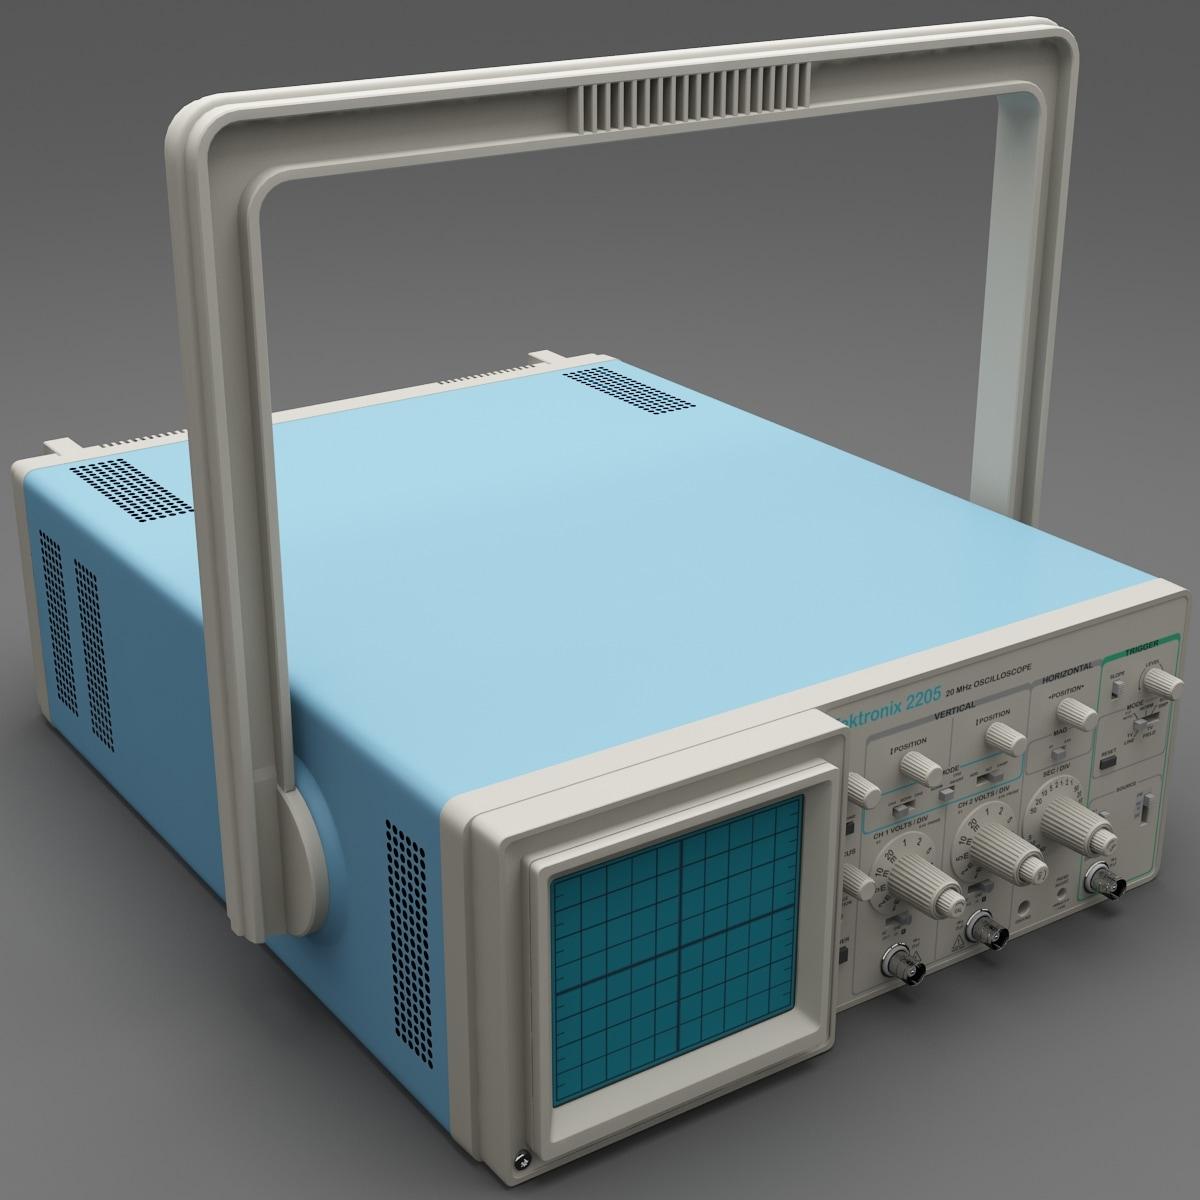 Oscilloscope_Tektronix_2205_01.jpg